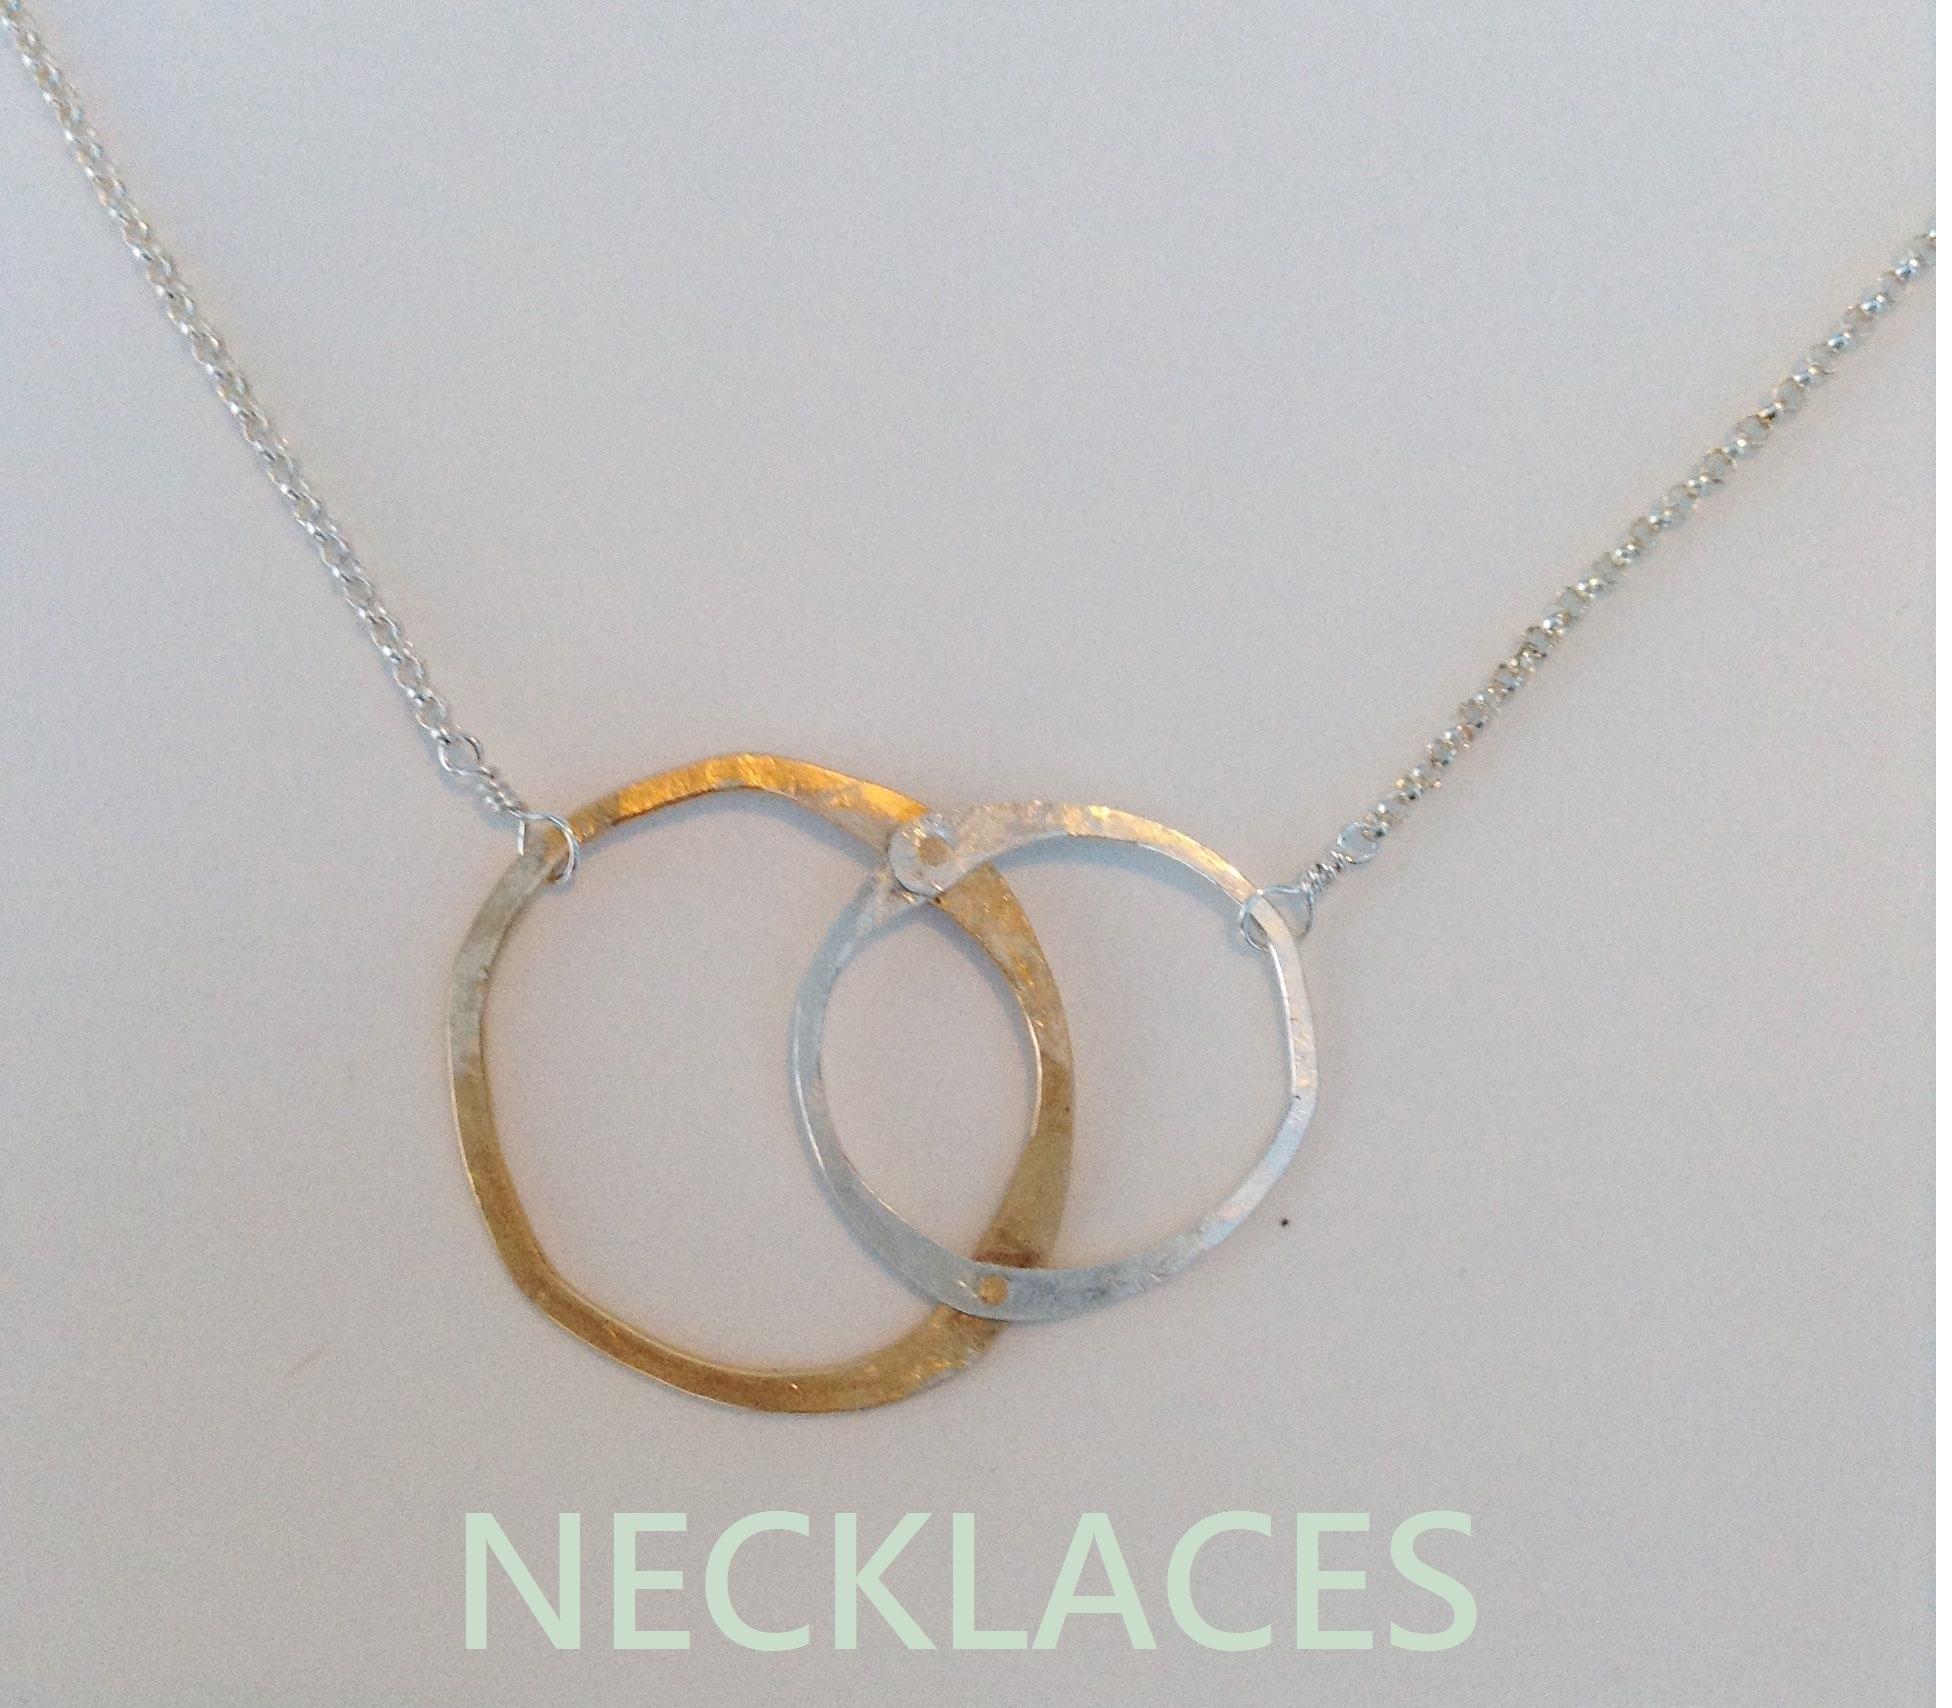 New Goods Necklaces